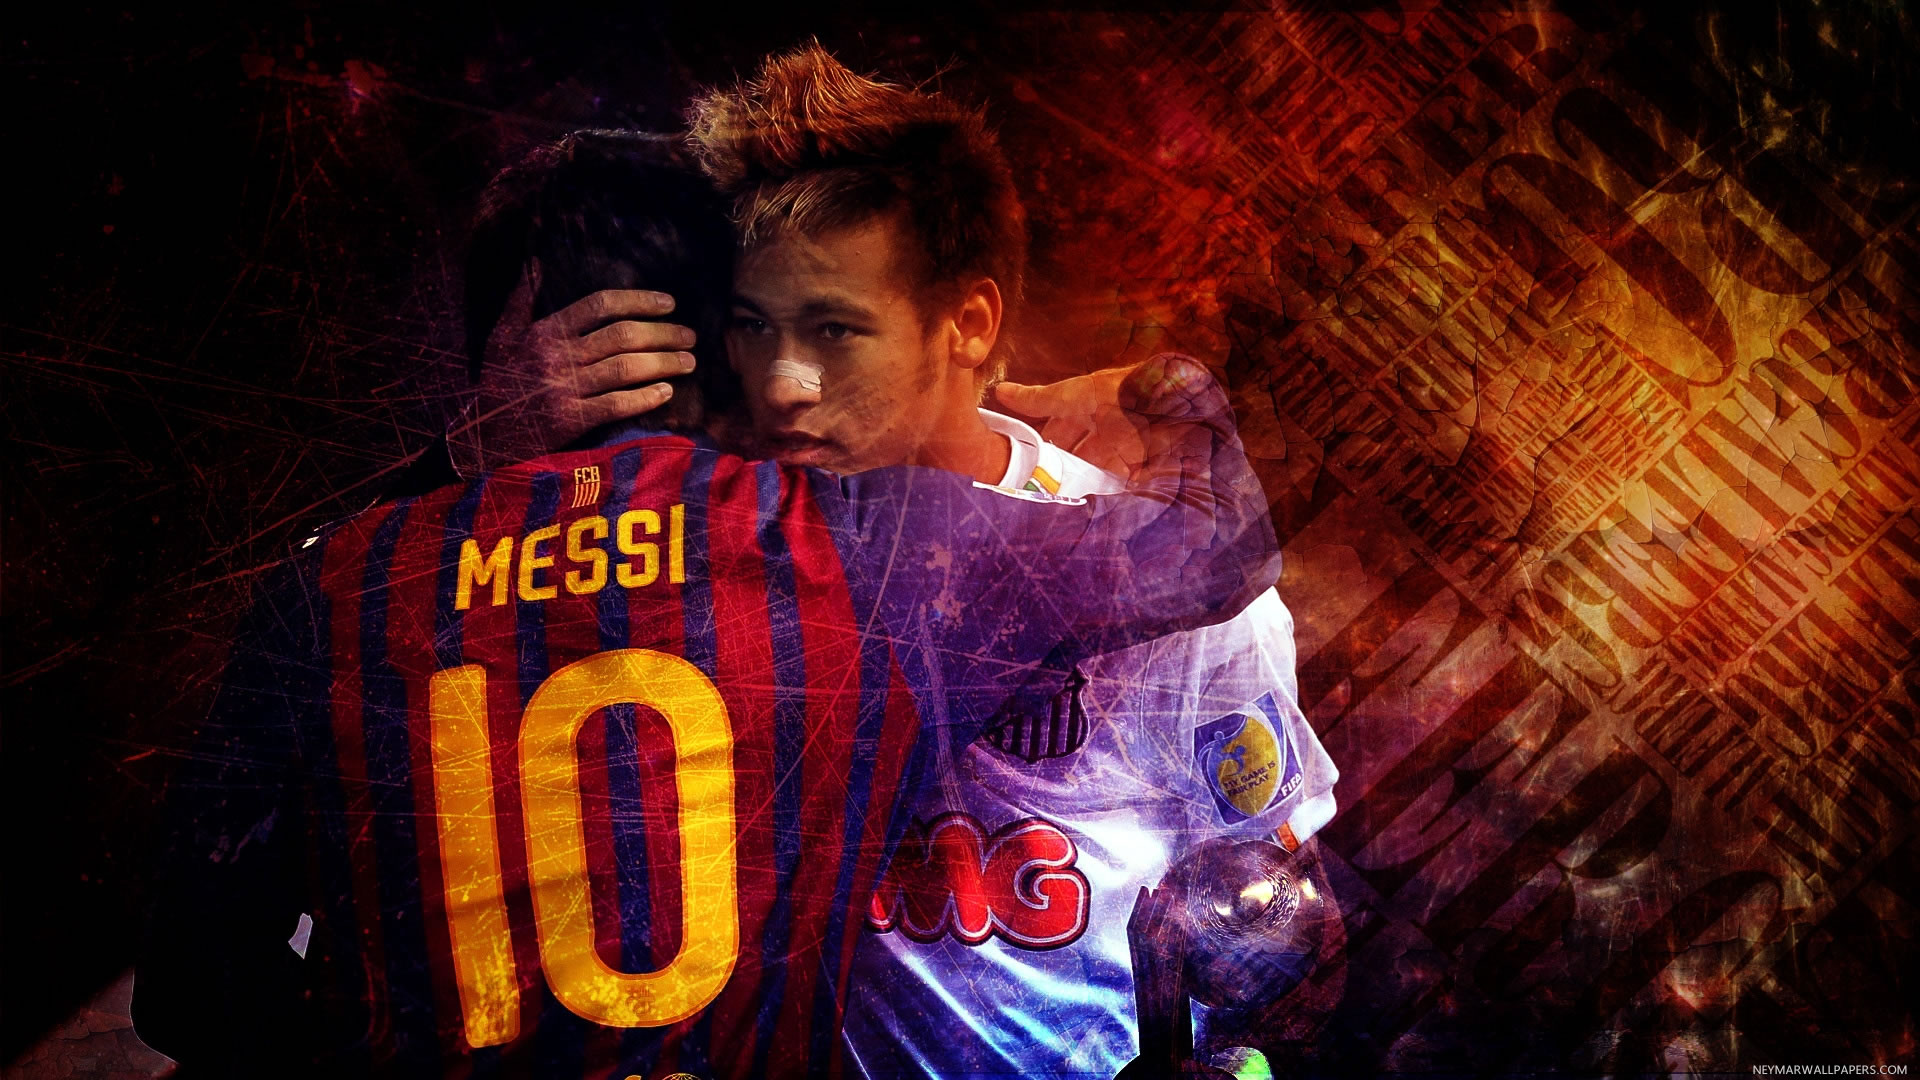 Neymar hugging Messi wallpaper